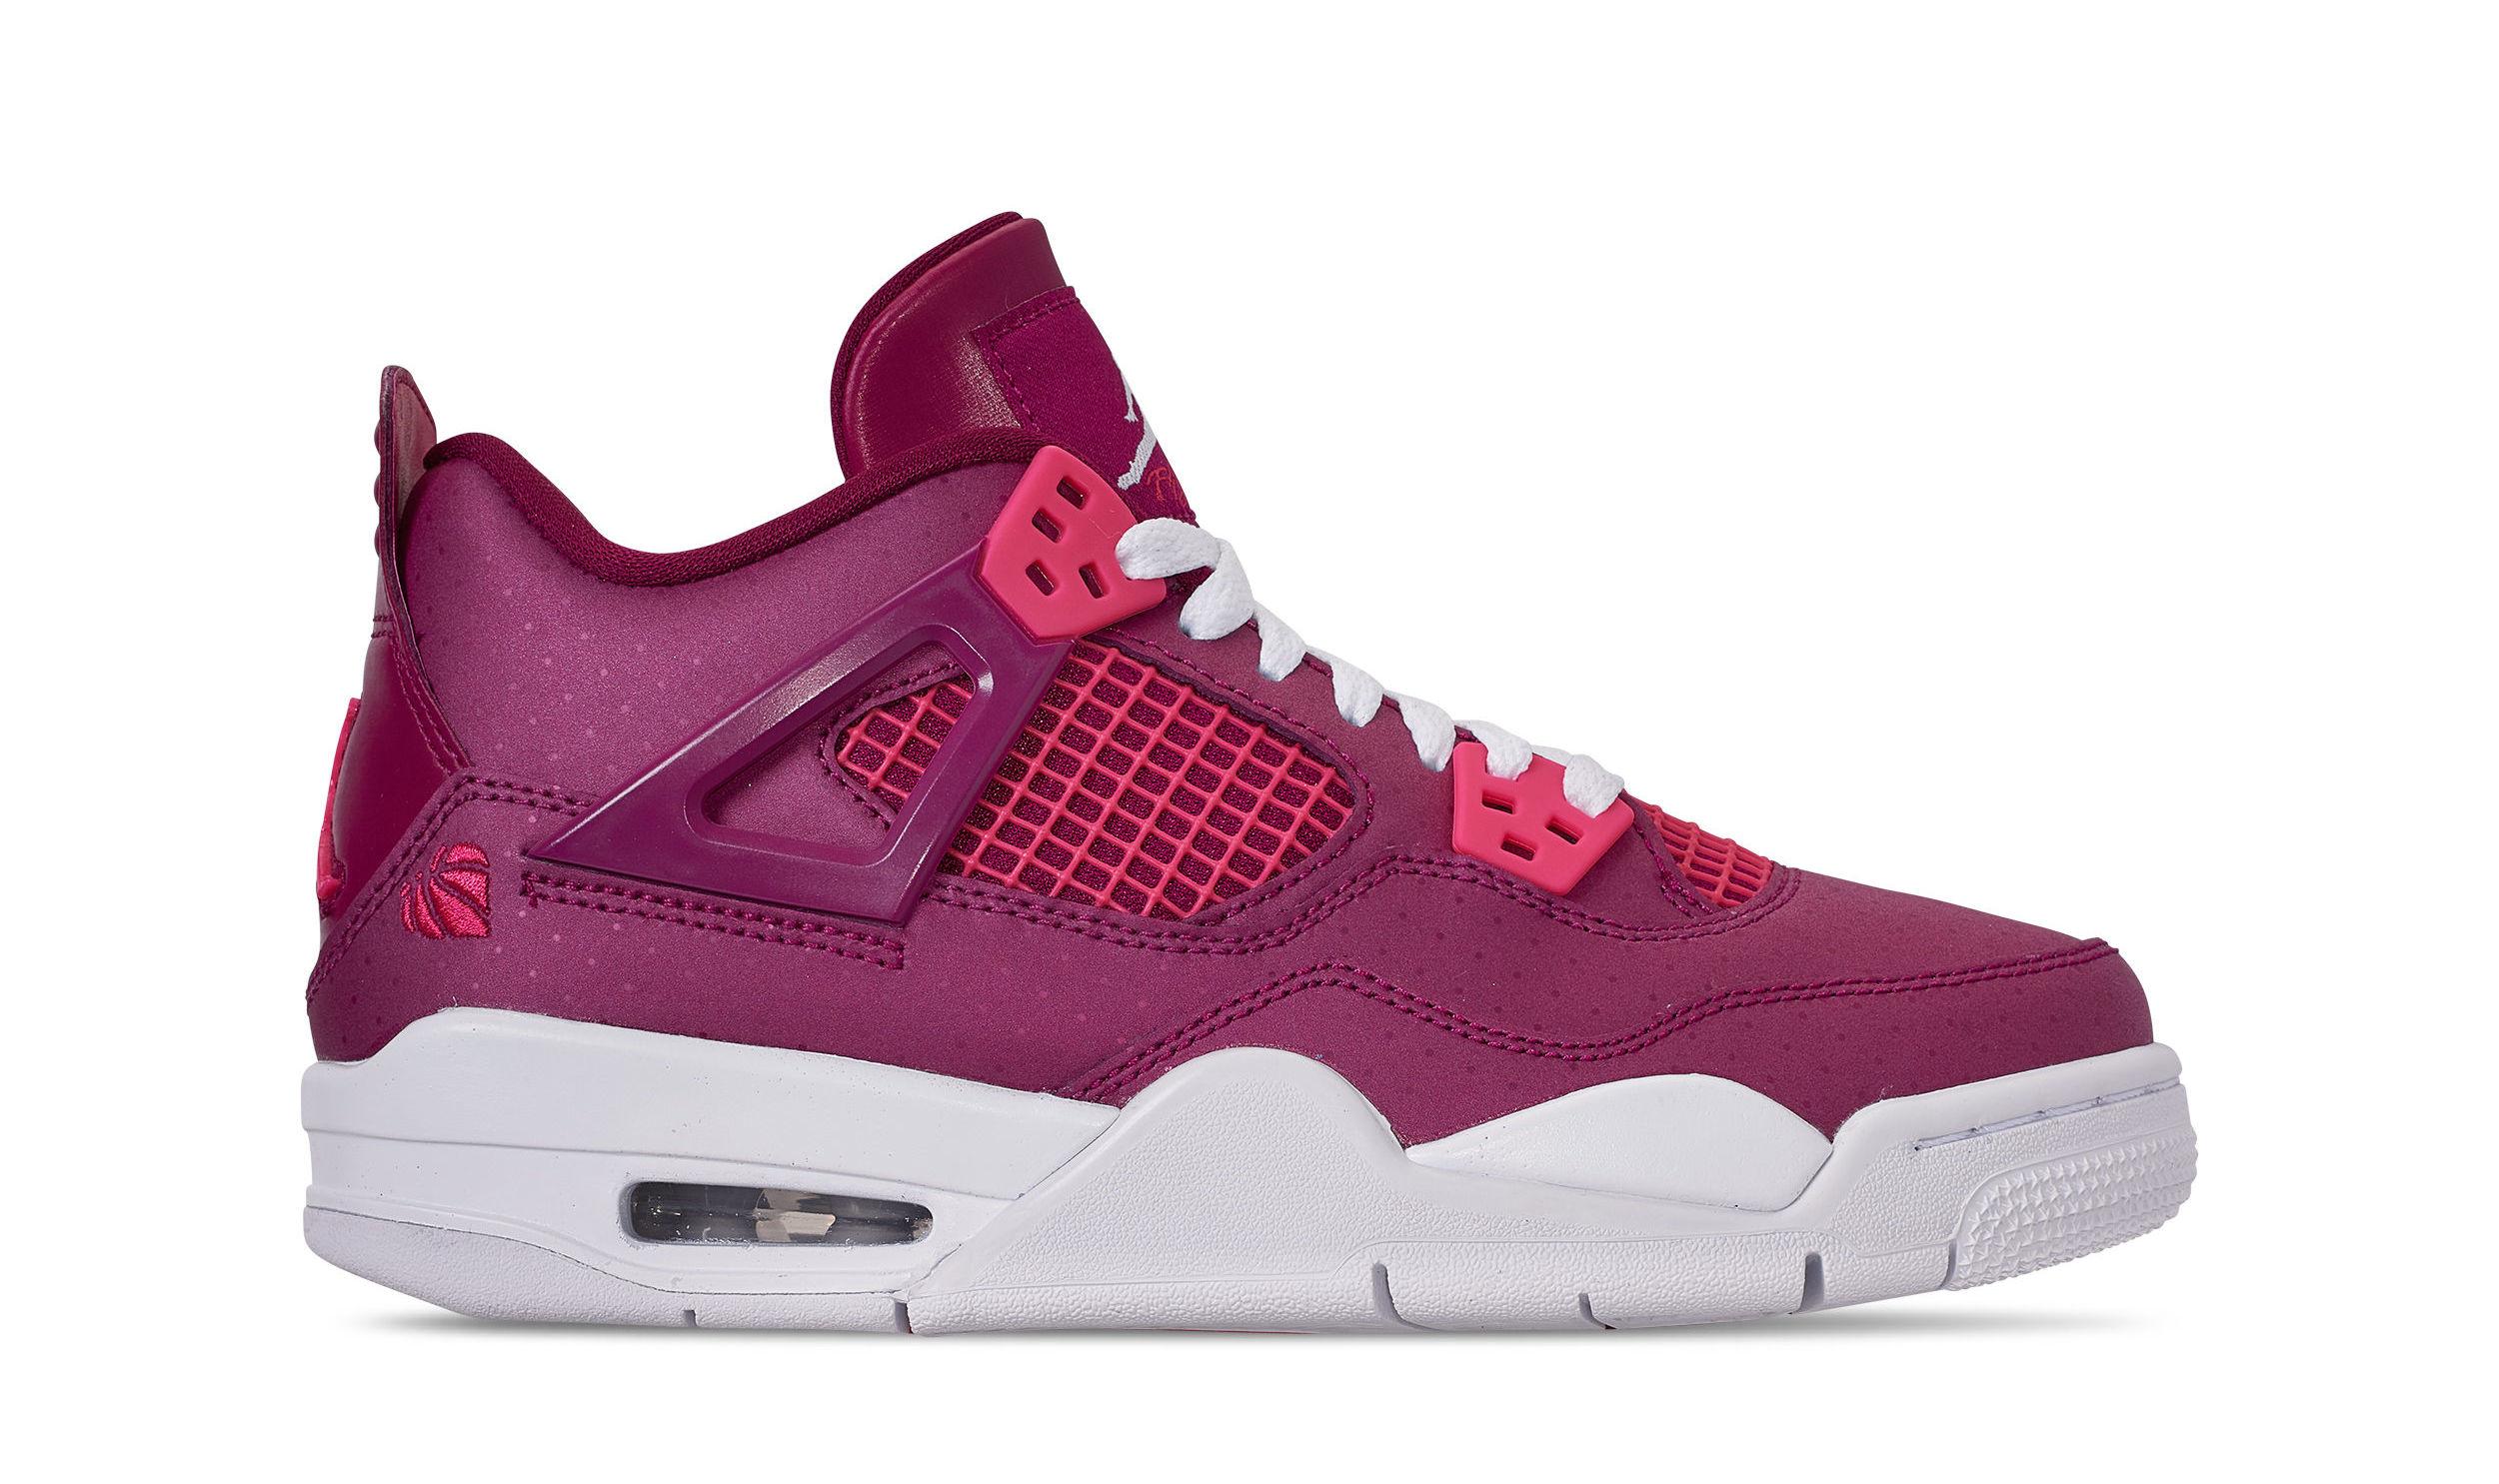 dbb862e4218998 Air Jordan 4 Retro GS  Valentine s Day  True Berry Rush Pink White  487724-661 Release Date